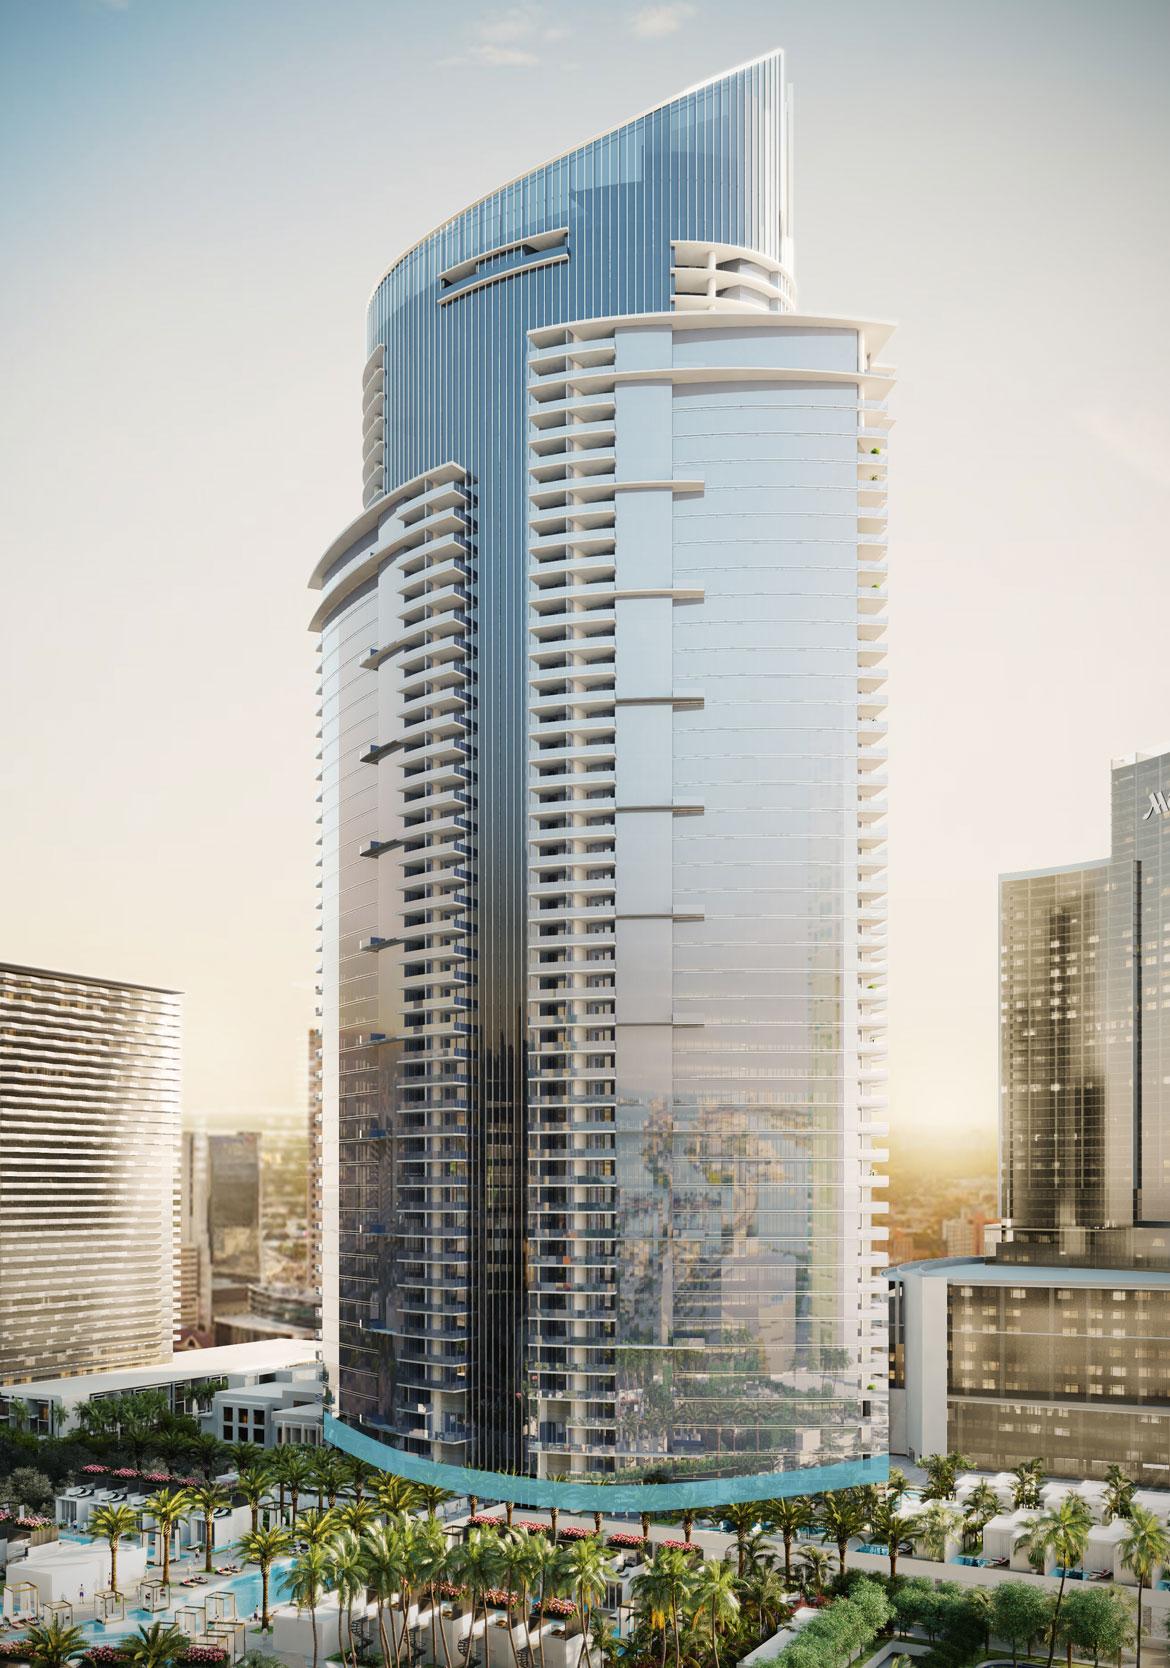 skyview image of Miami World Center